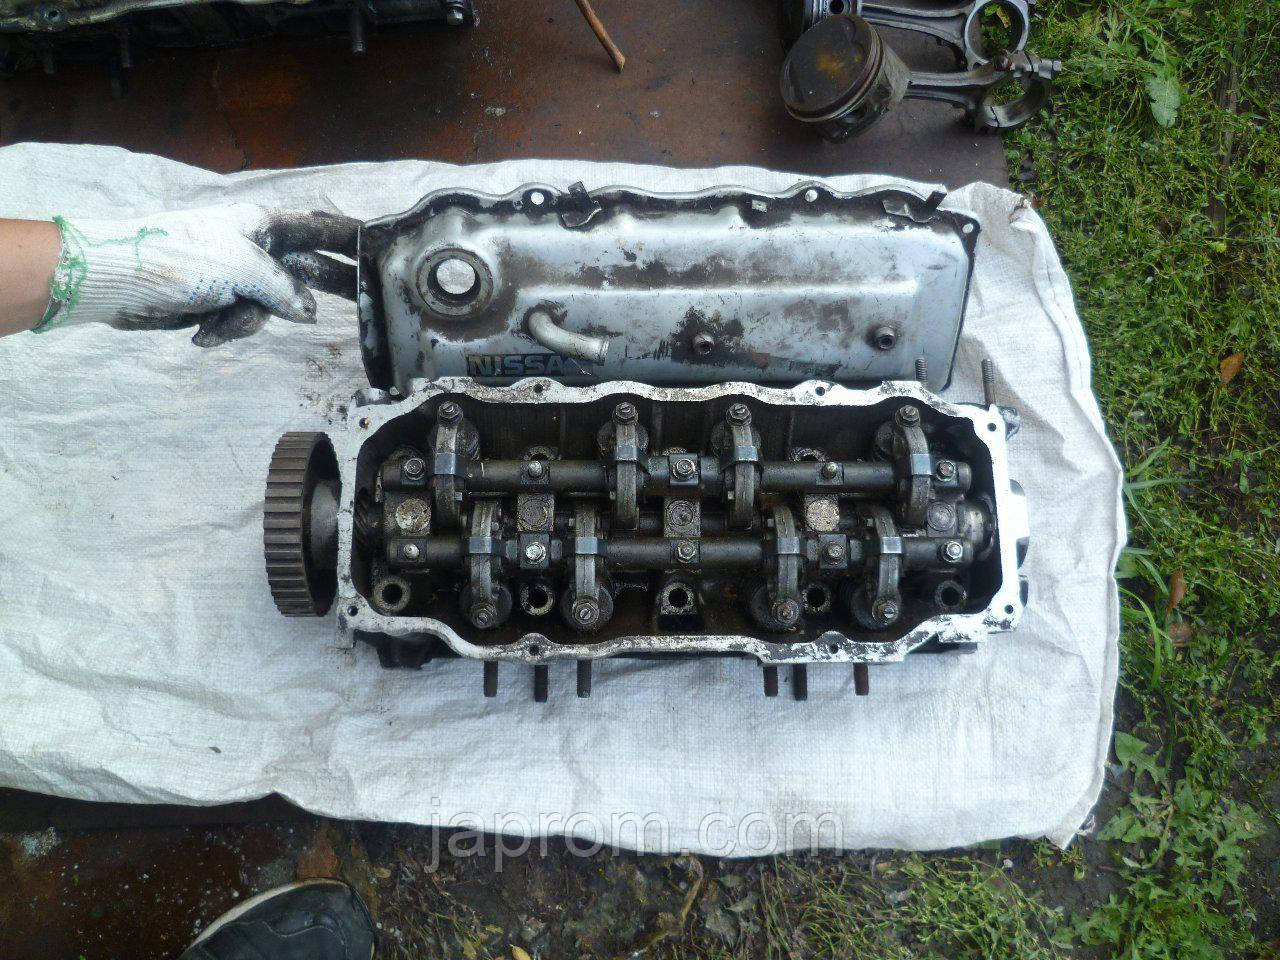 Головка блока цилиндров (ГБЦ) Nissan Bluebird U11 1983-1990г.в. CA20